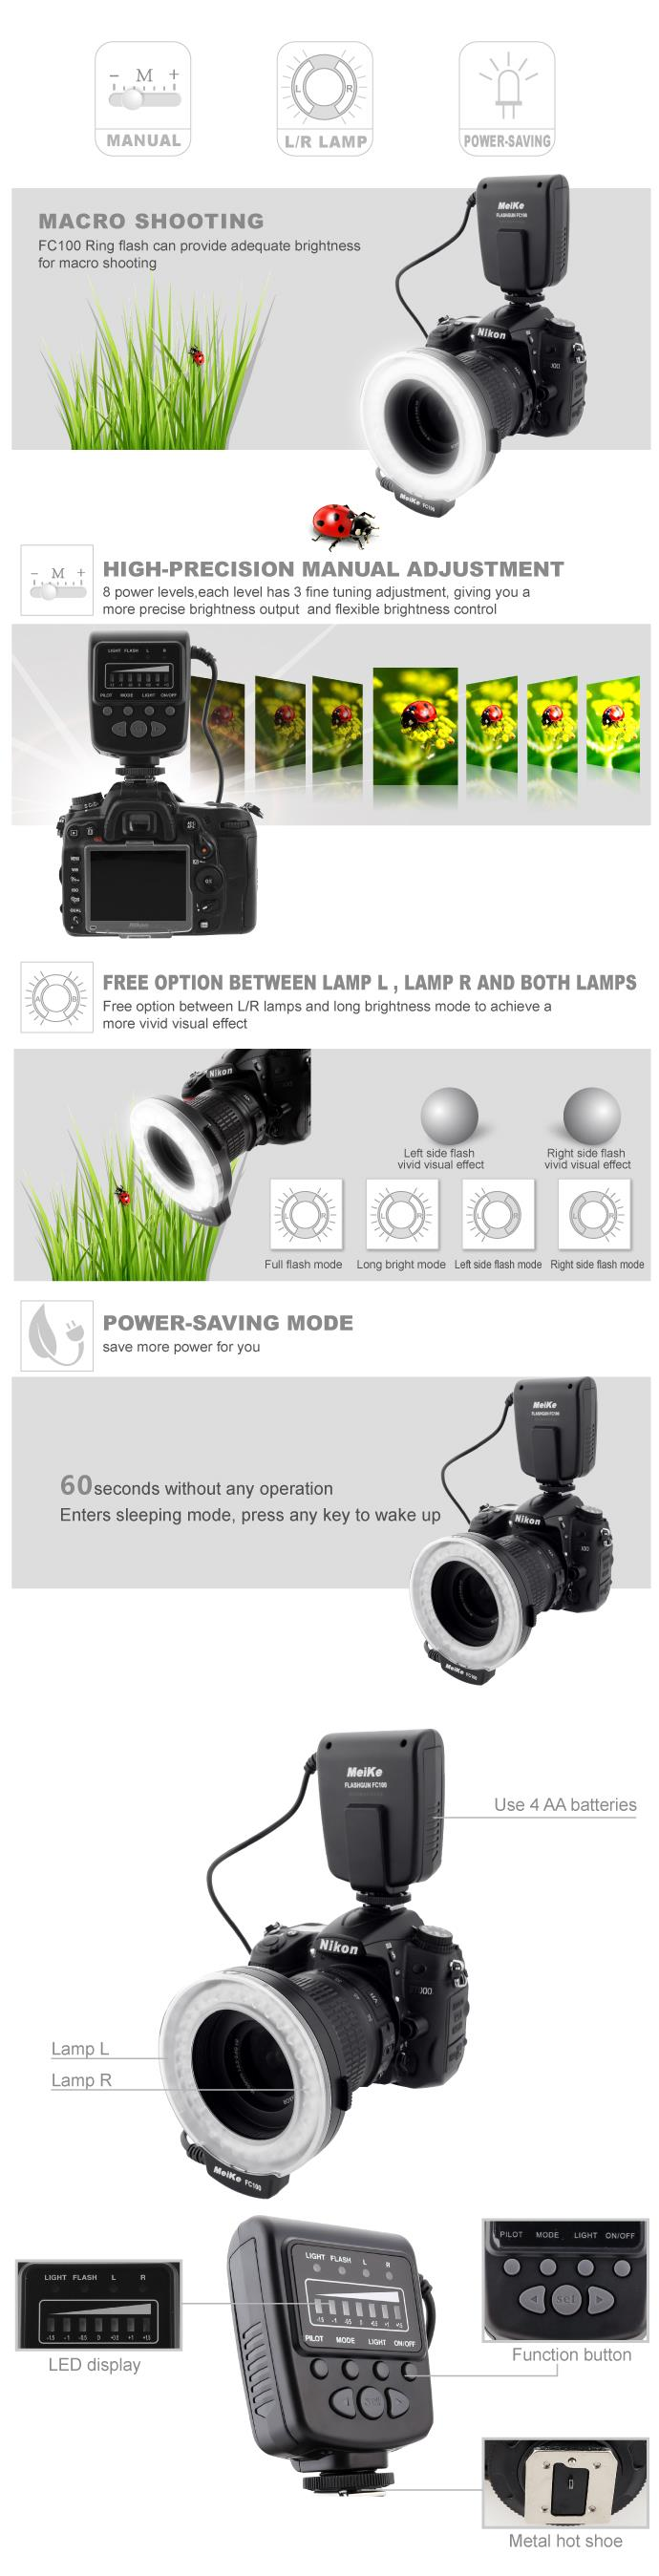 Mcplus MP-MRF32 מאקרו הבזק טבעת האור במצלמות Nikon D7100 D7000 D5200 D5100 D3200 D3100 D3000 D800 D600 D90 D80 של FC-100